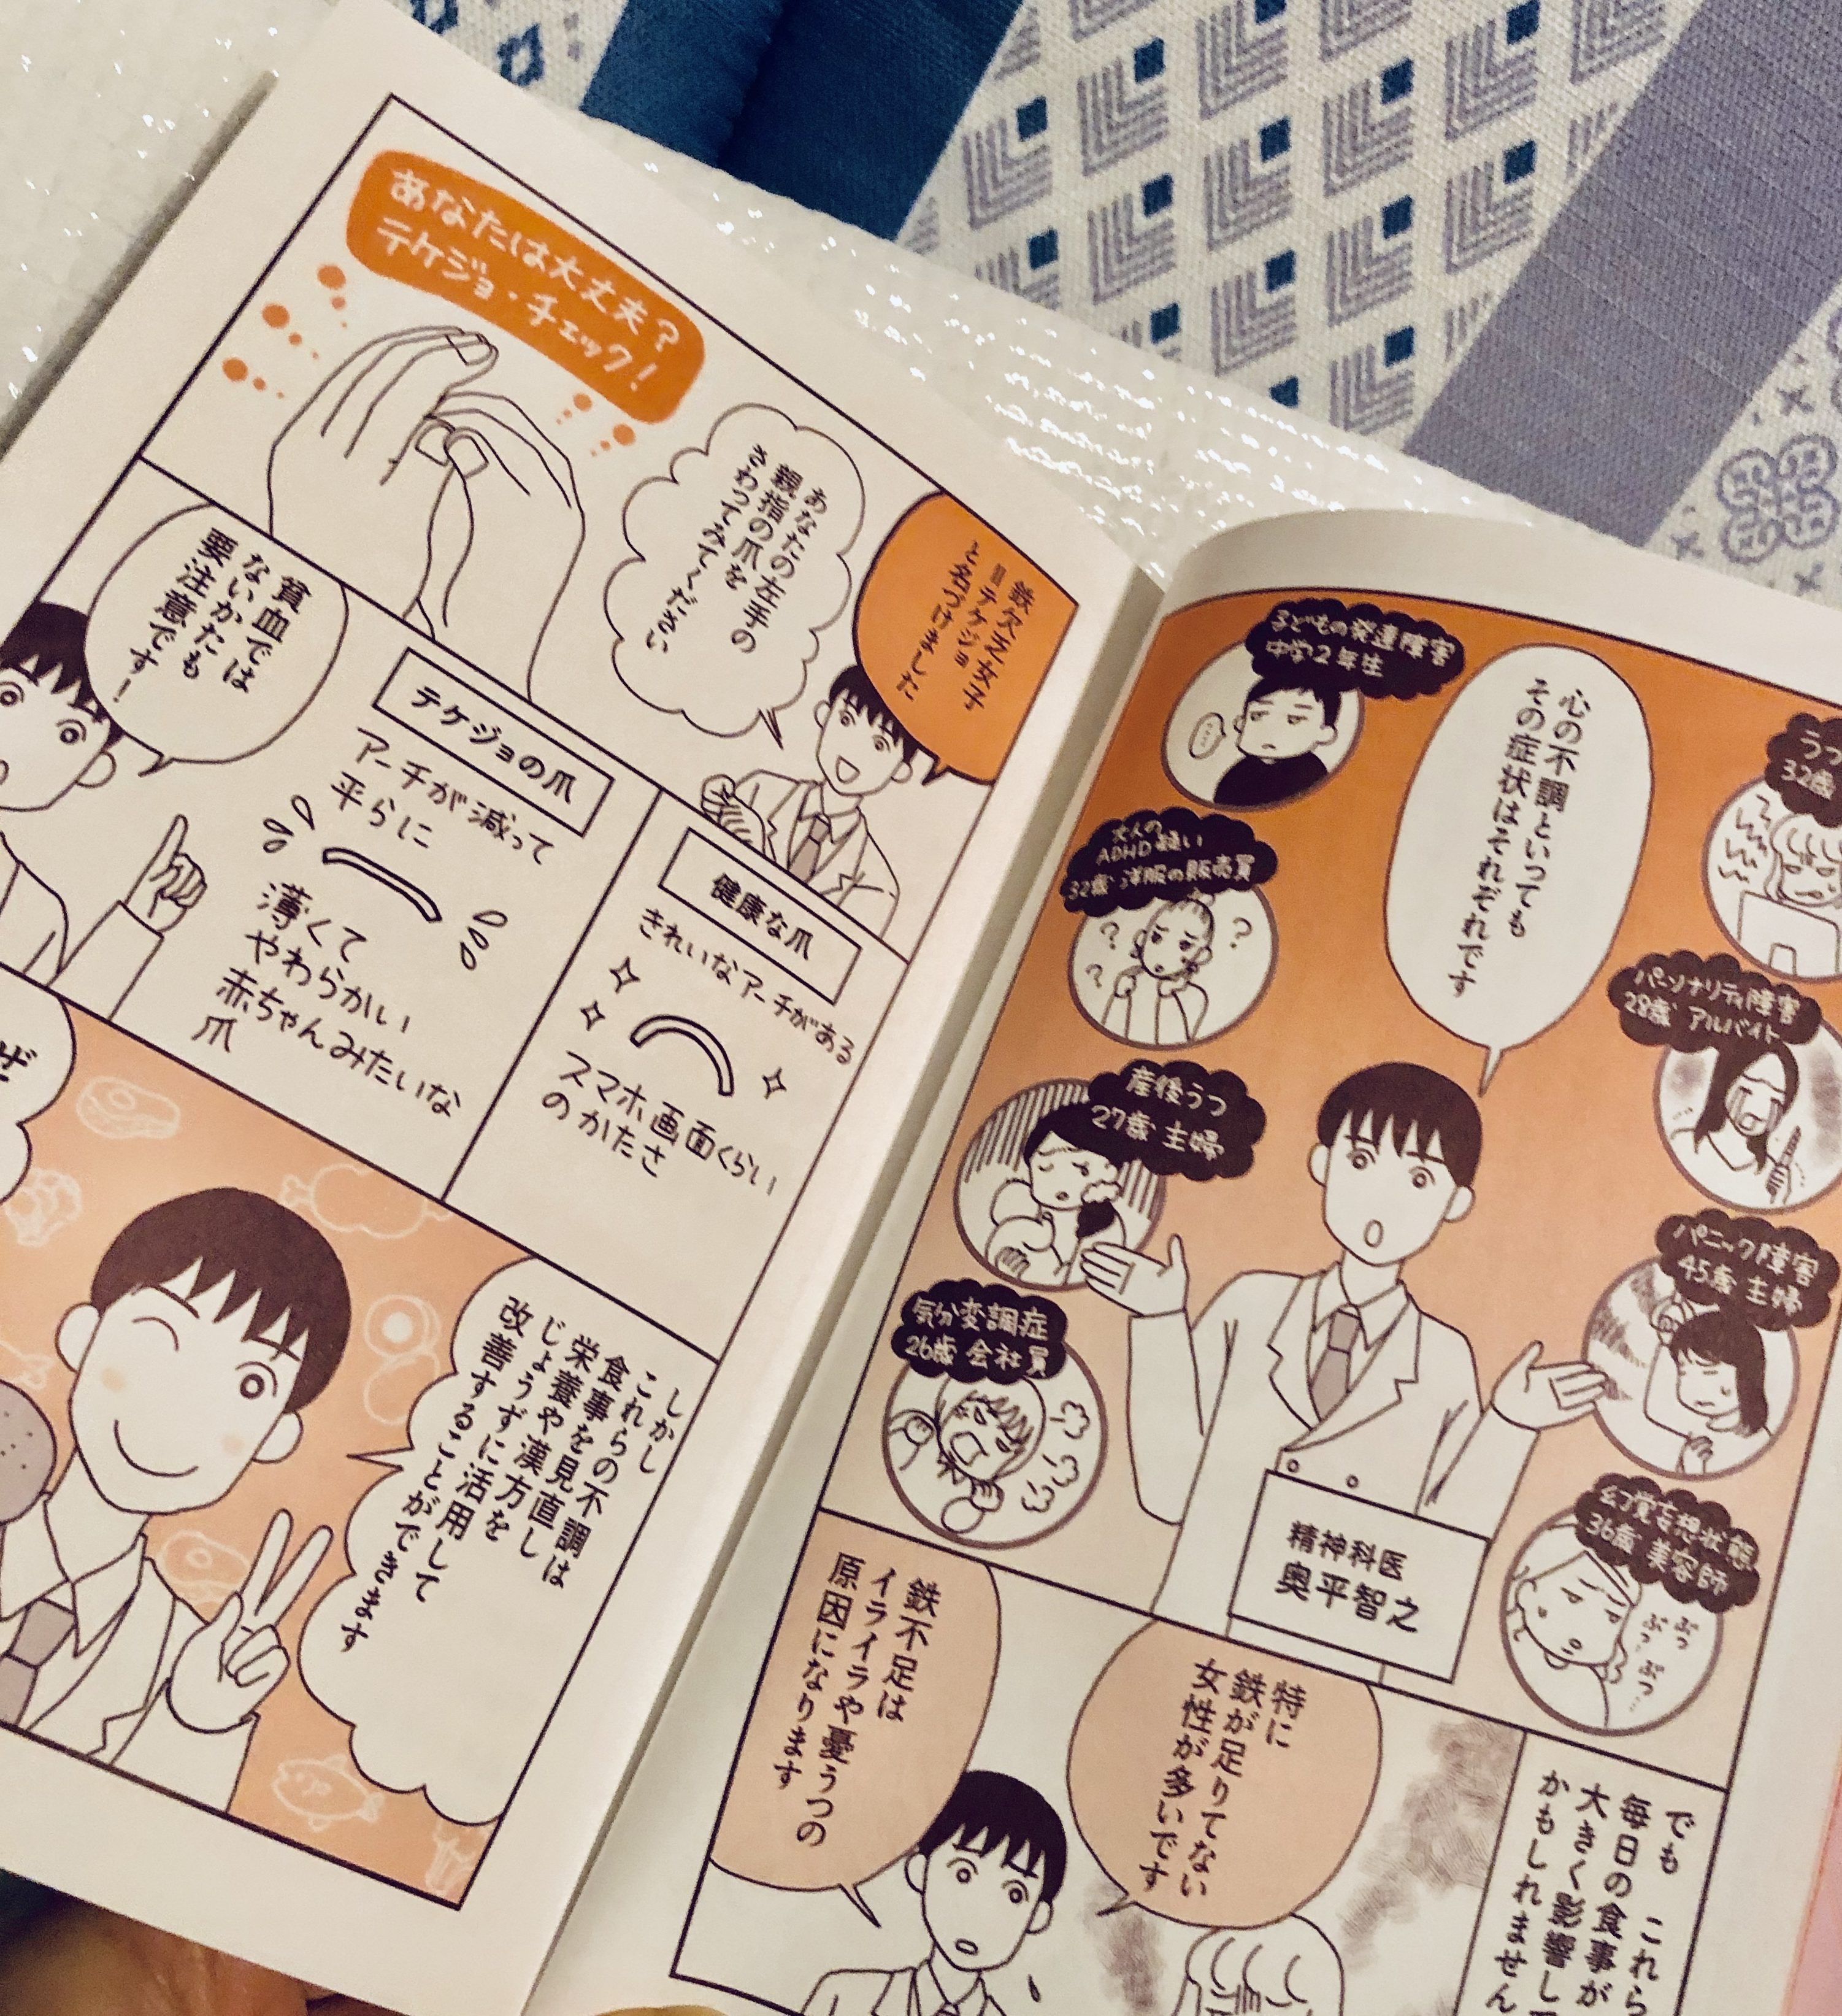 book tabete utsunuke manga